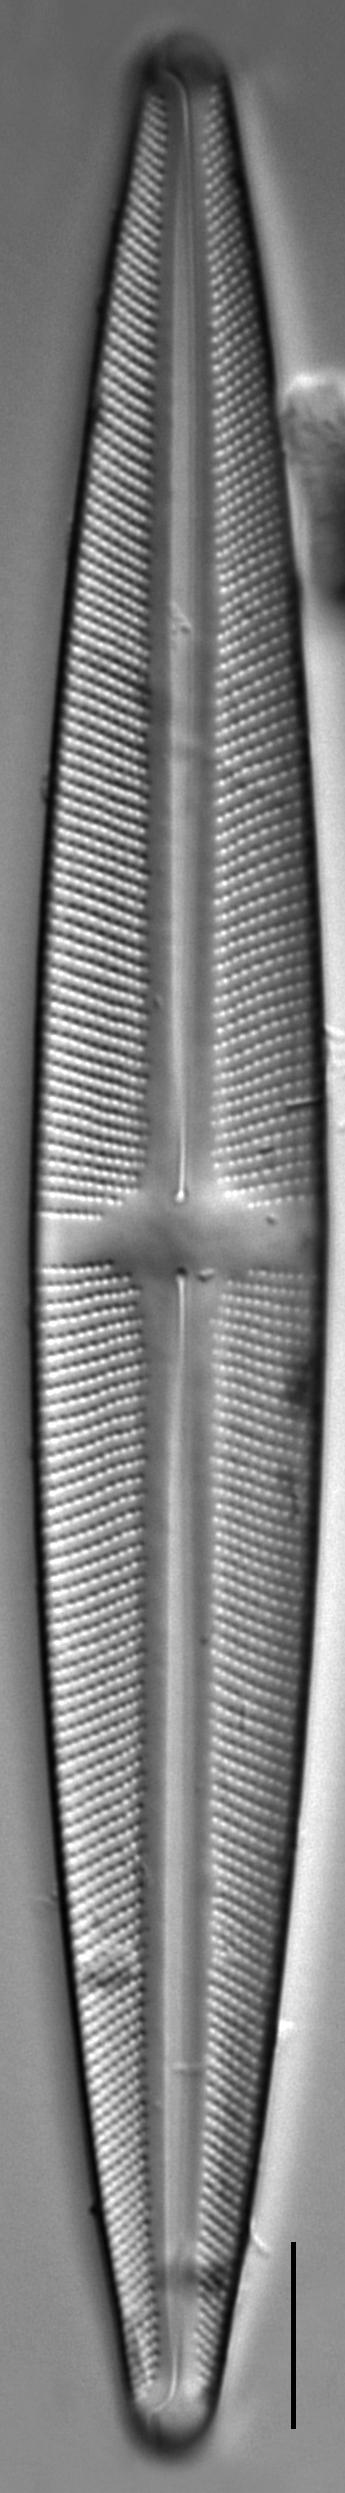 Stauroneis kingstonii | Species - Diatoms of North America